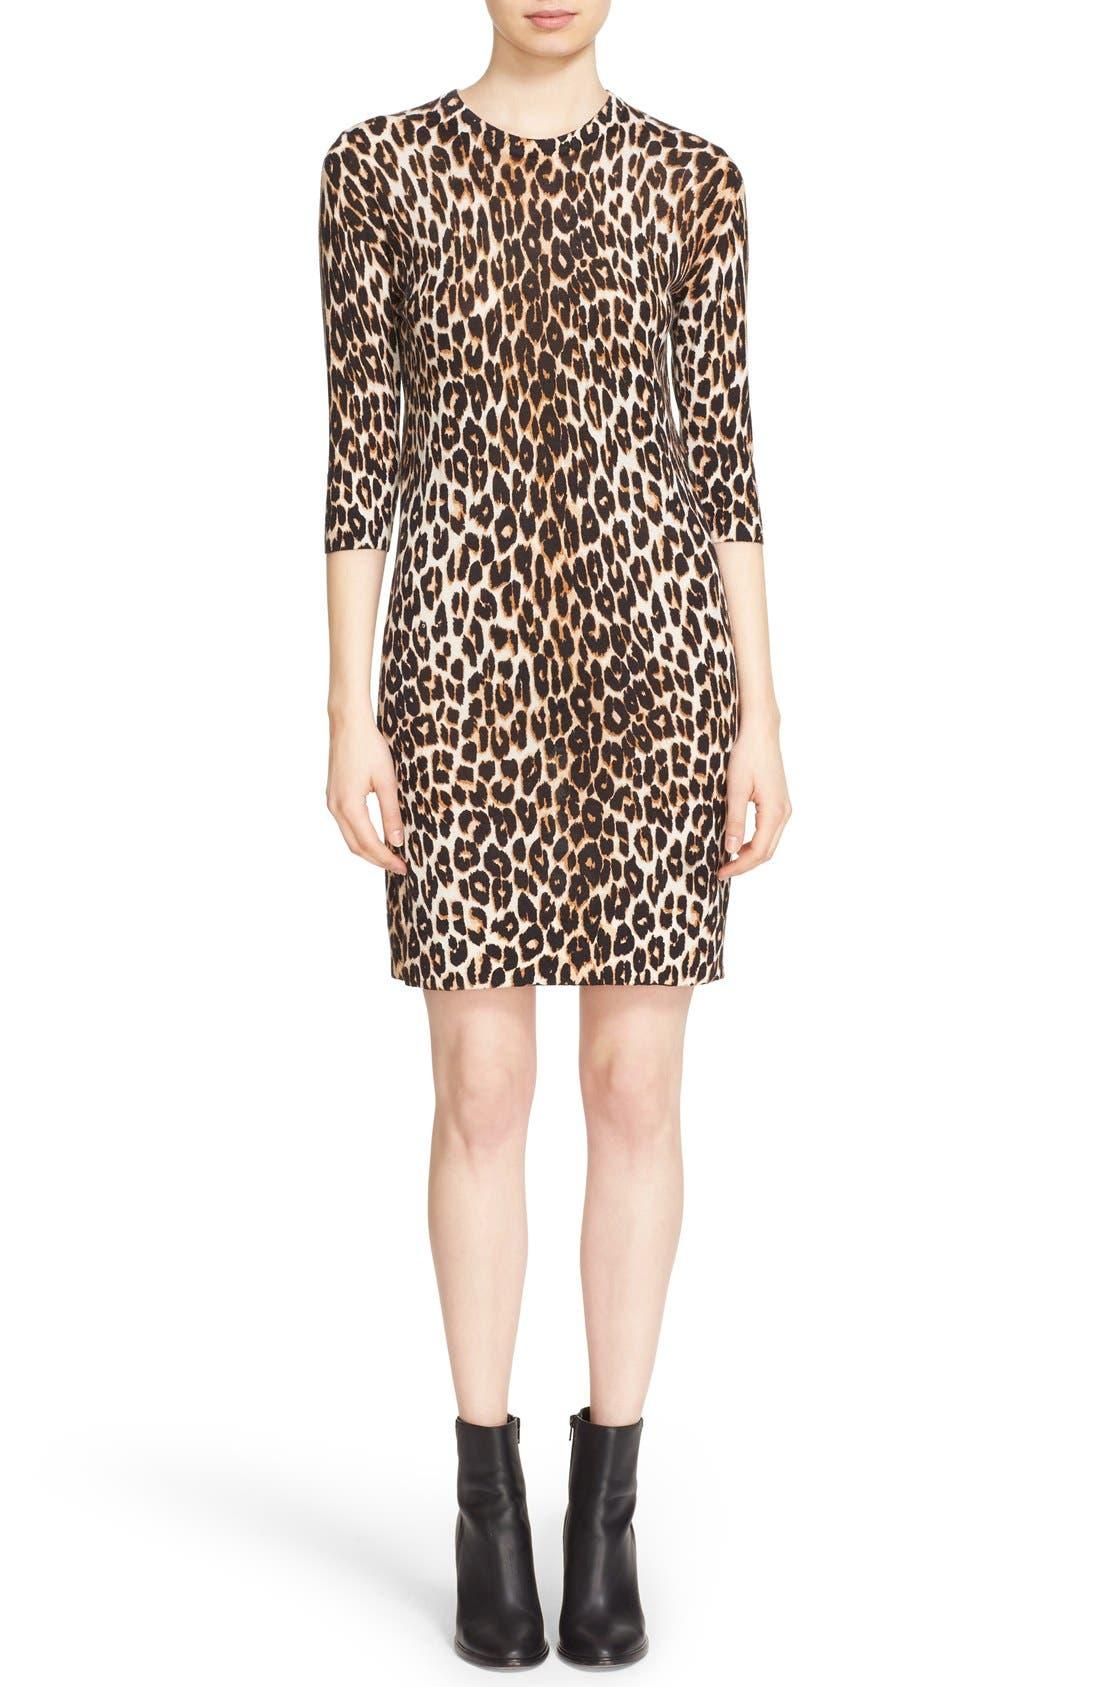 Main Image - Equipment 'Marta' Leopard Print Silk & Cashmere Knit Dress